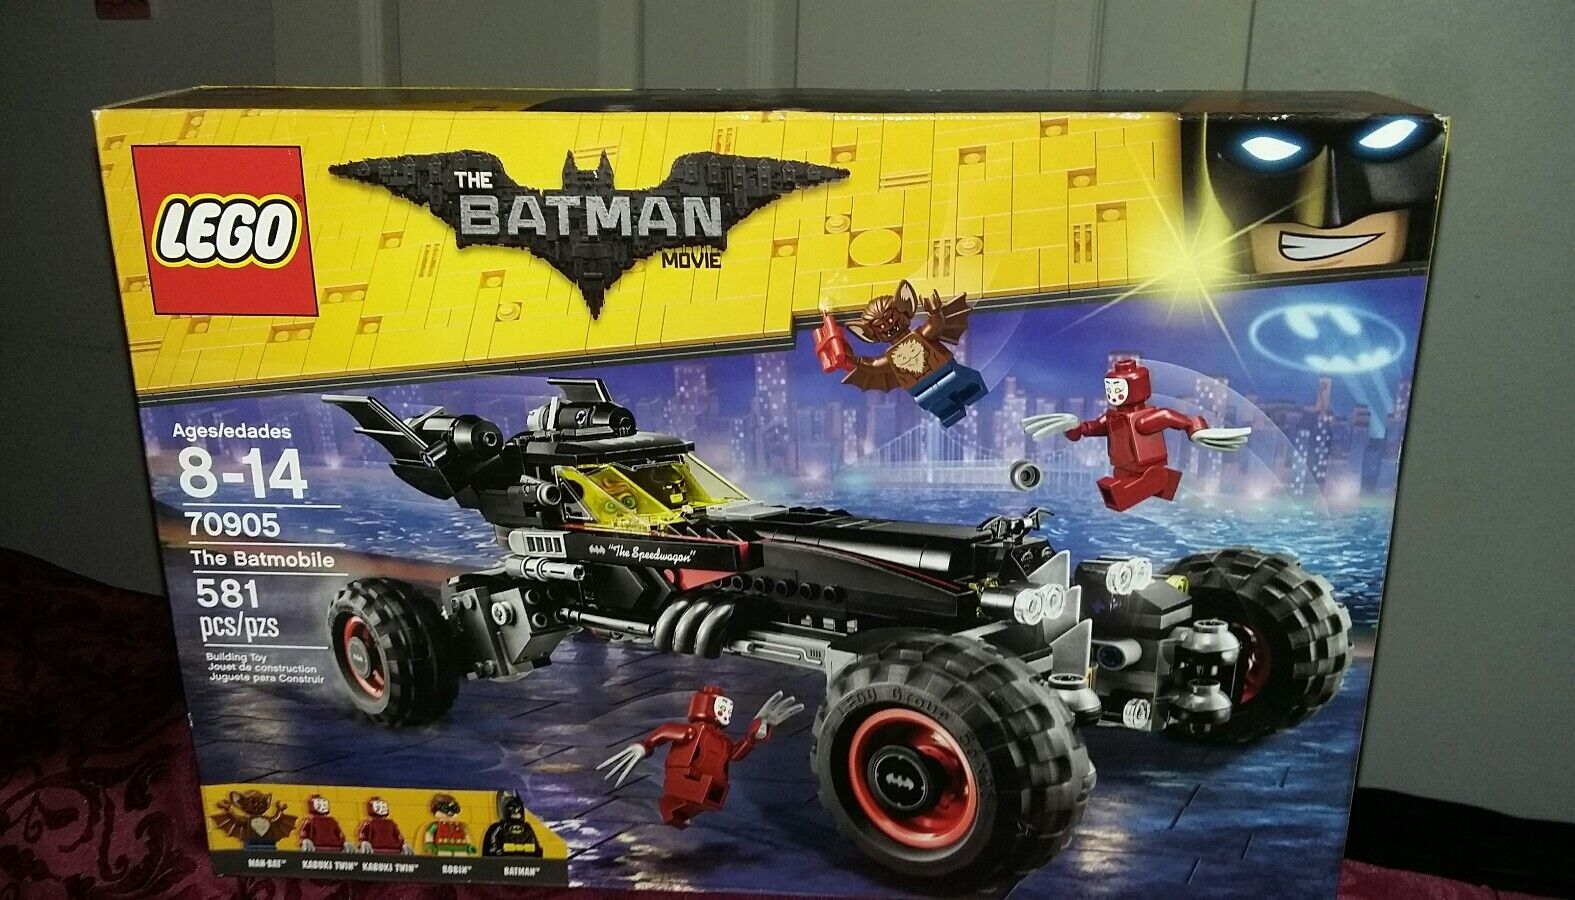 LEGOS The Batman Movie Batmobile building toy new setpcs ages 8-14